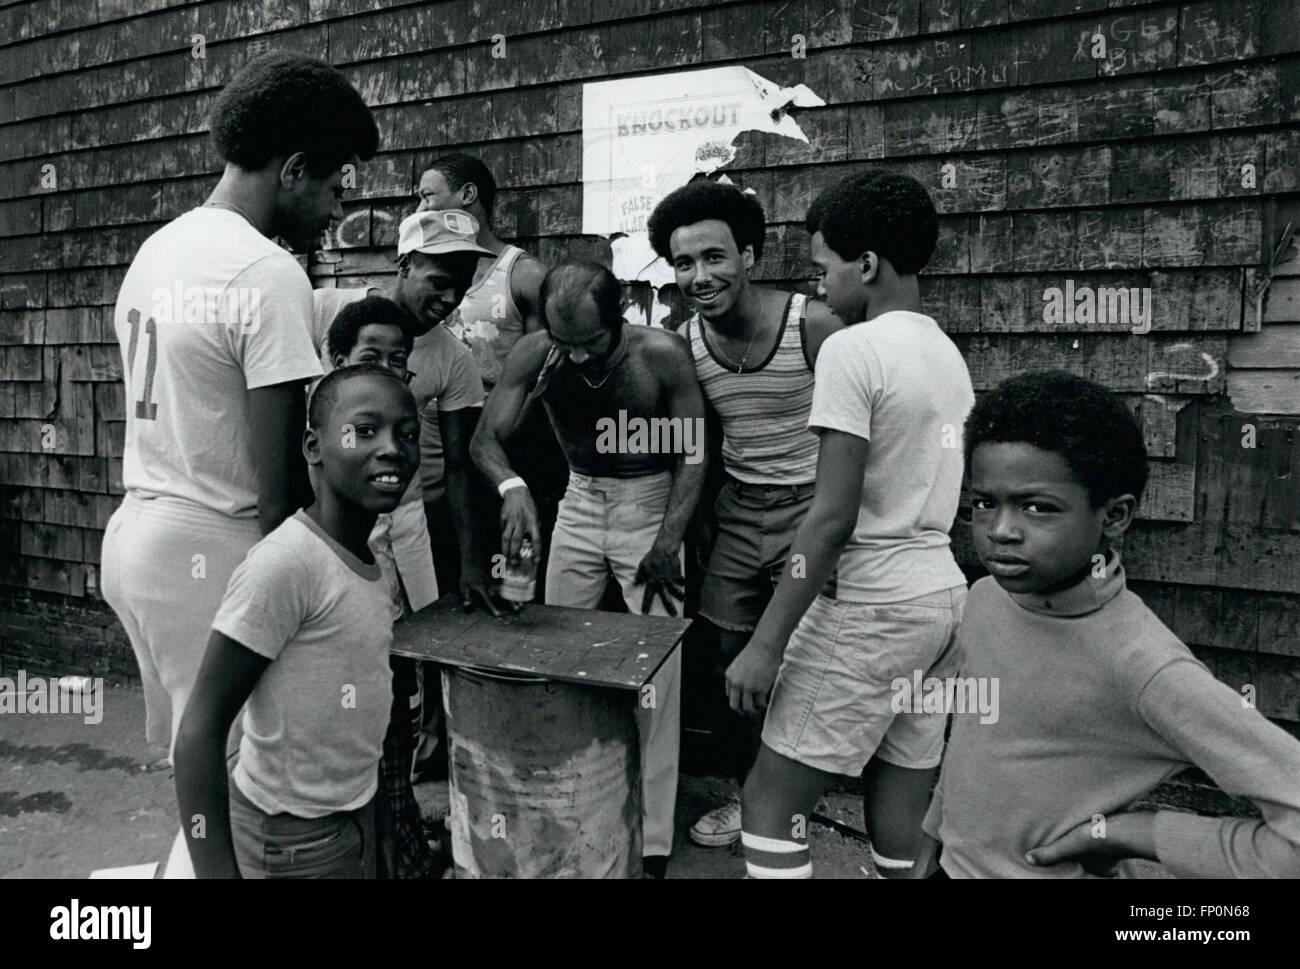 1962 - Bushwick section of Bky, Playing Chug-A-Lug A Betting game. © Keystone Pictures USA/ZUMAPRESS.com/Alamy Live Stock Photo